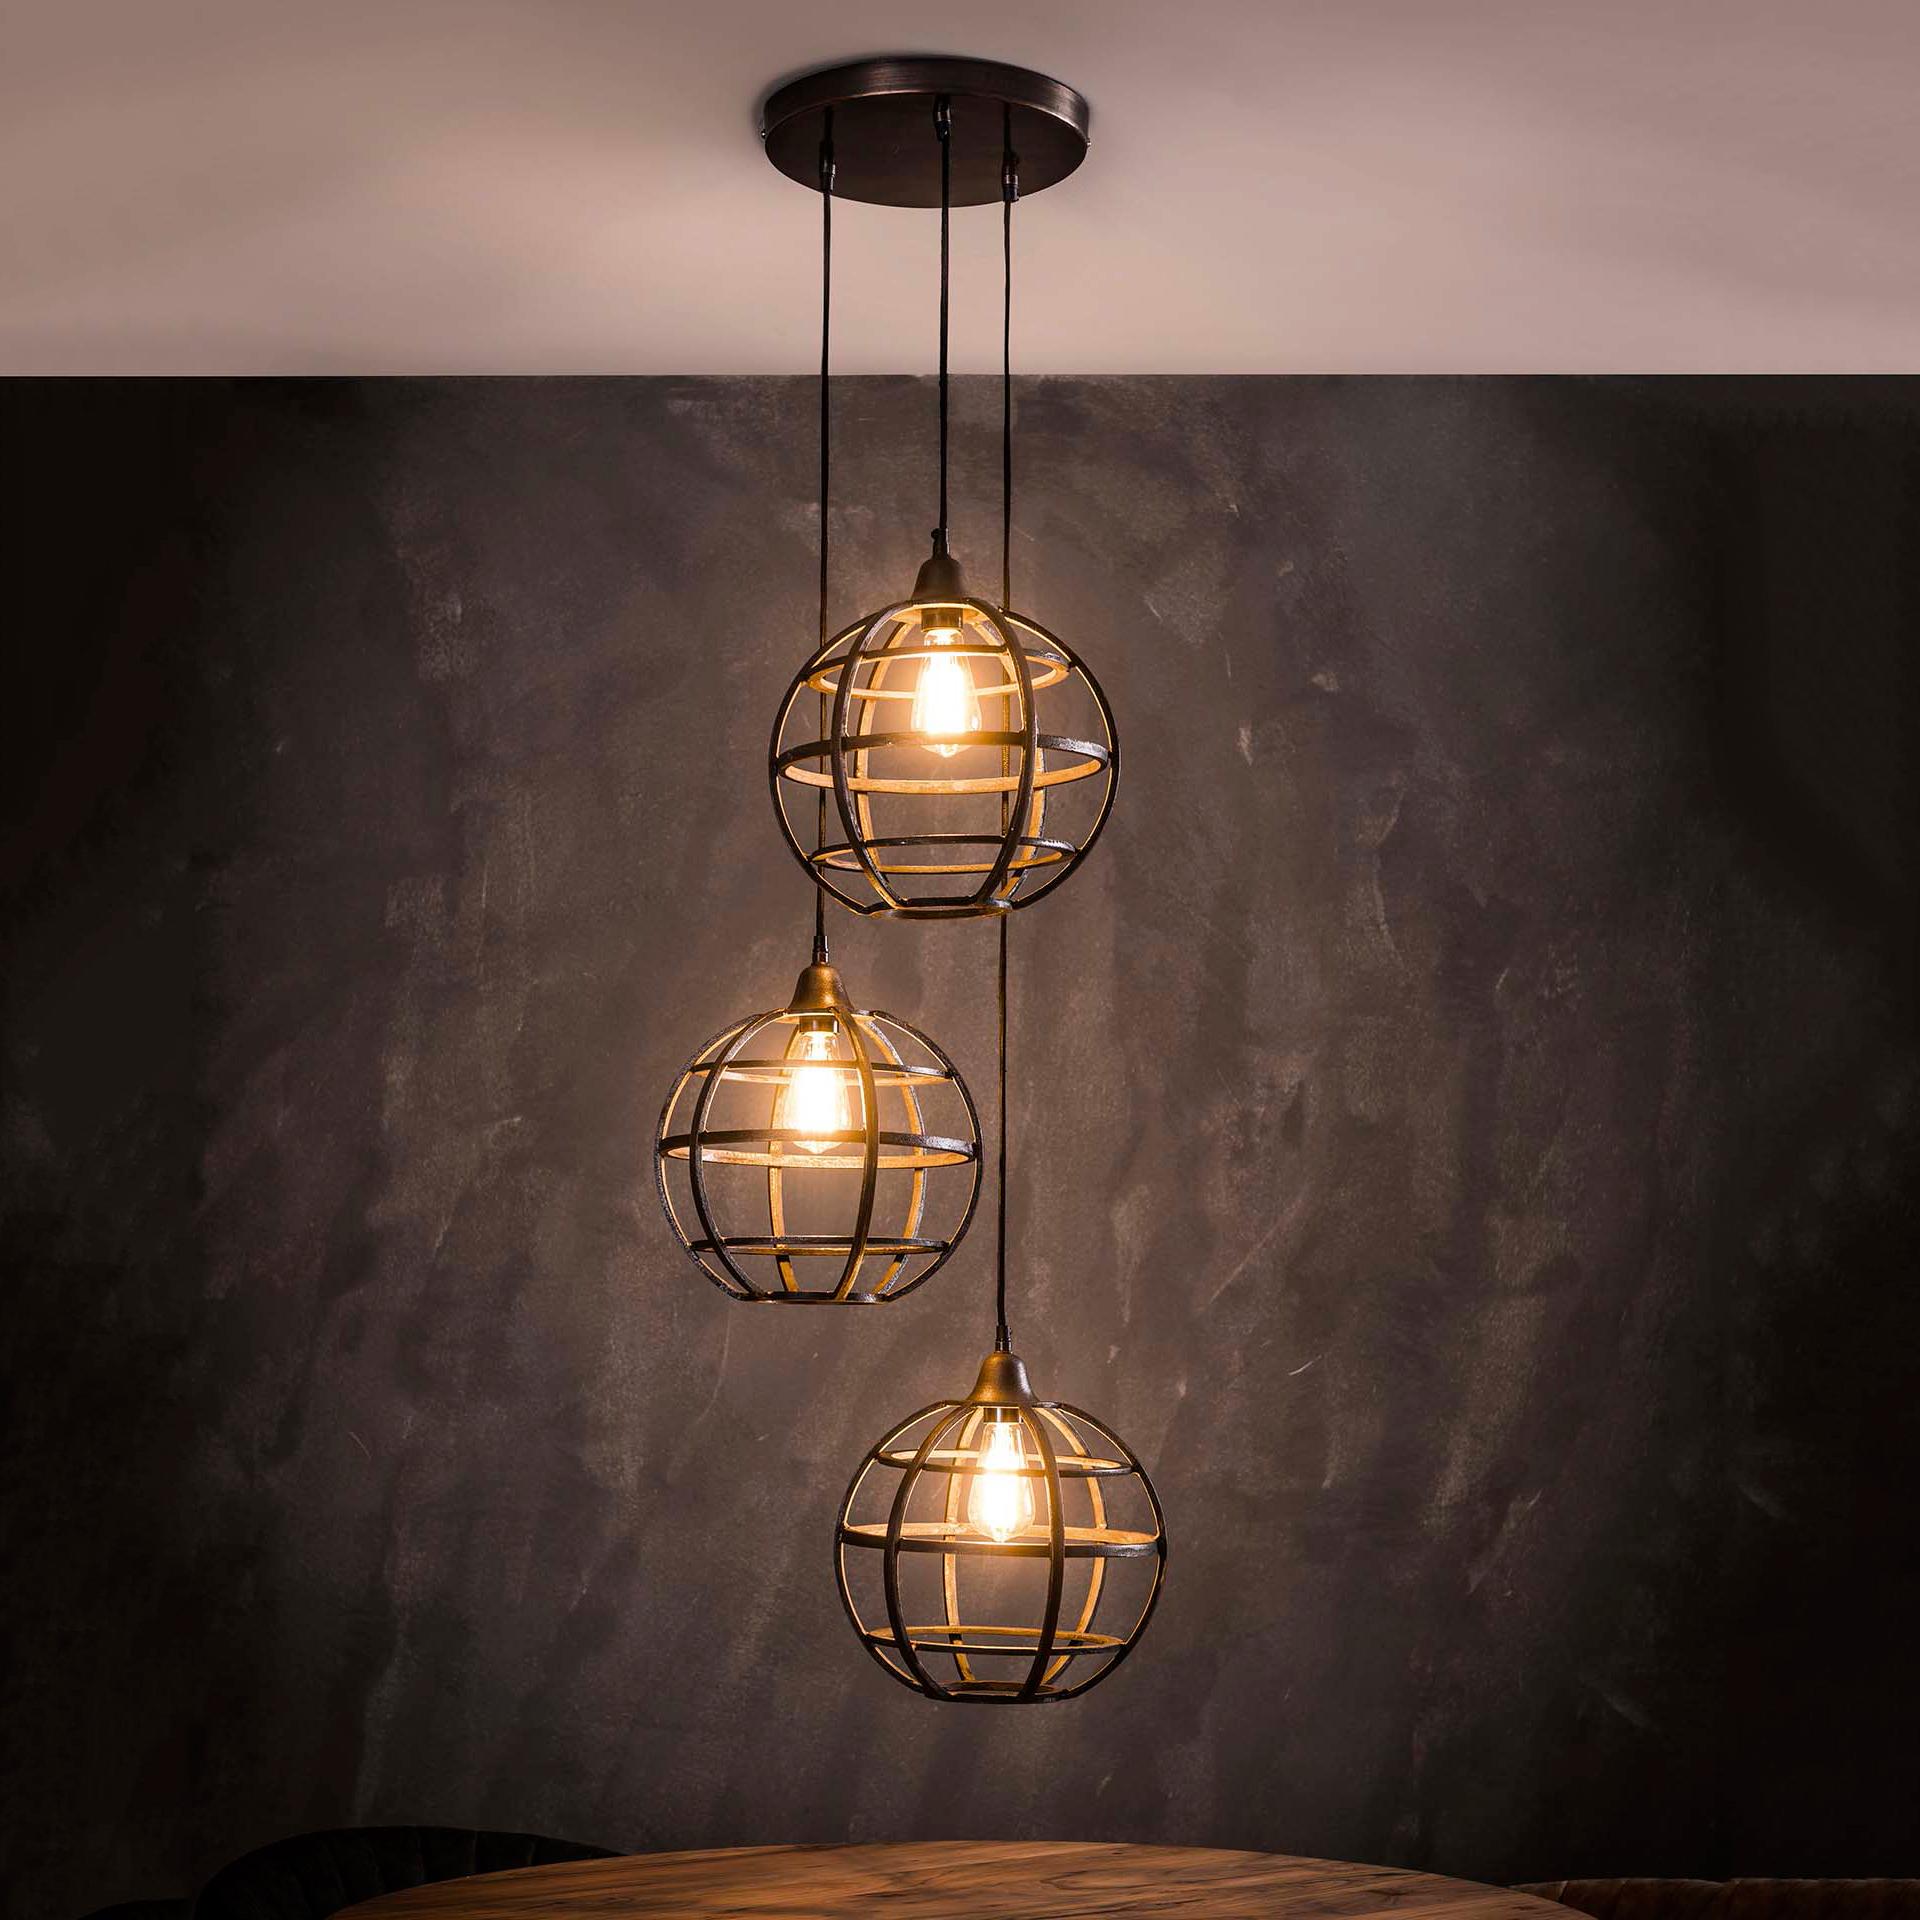 Hanglamp 'Tatsuya' 3-lamps, Ø33 cm korting